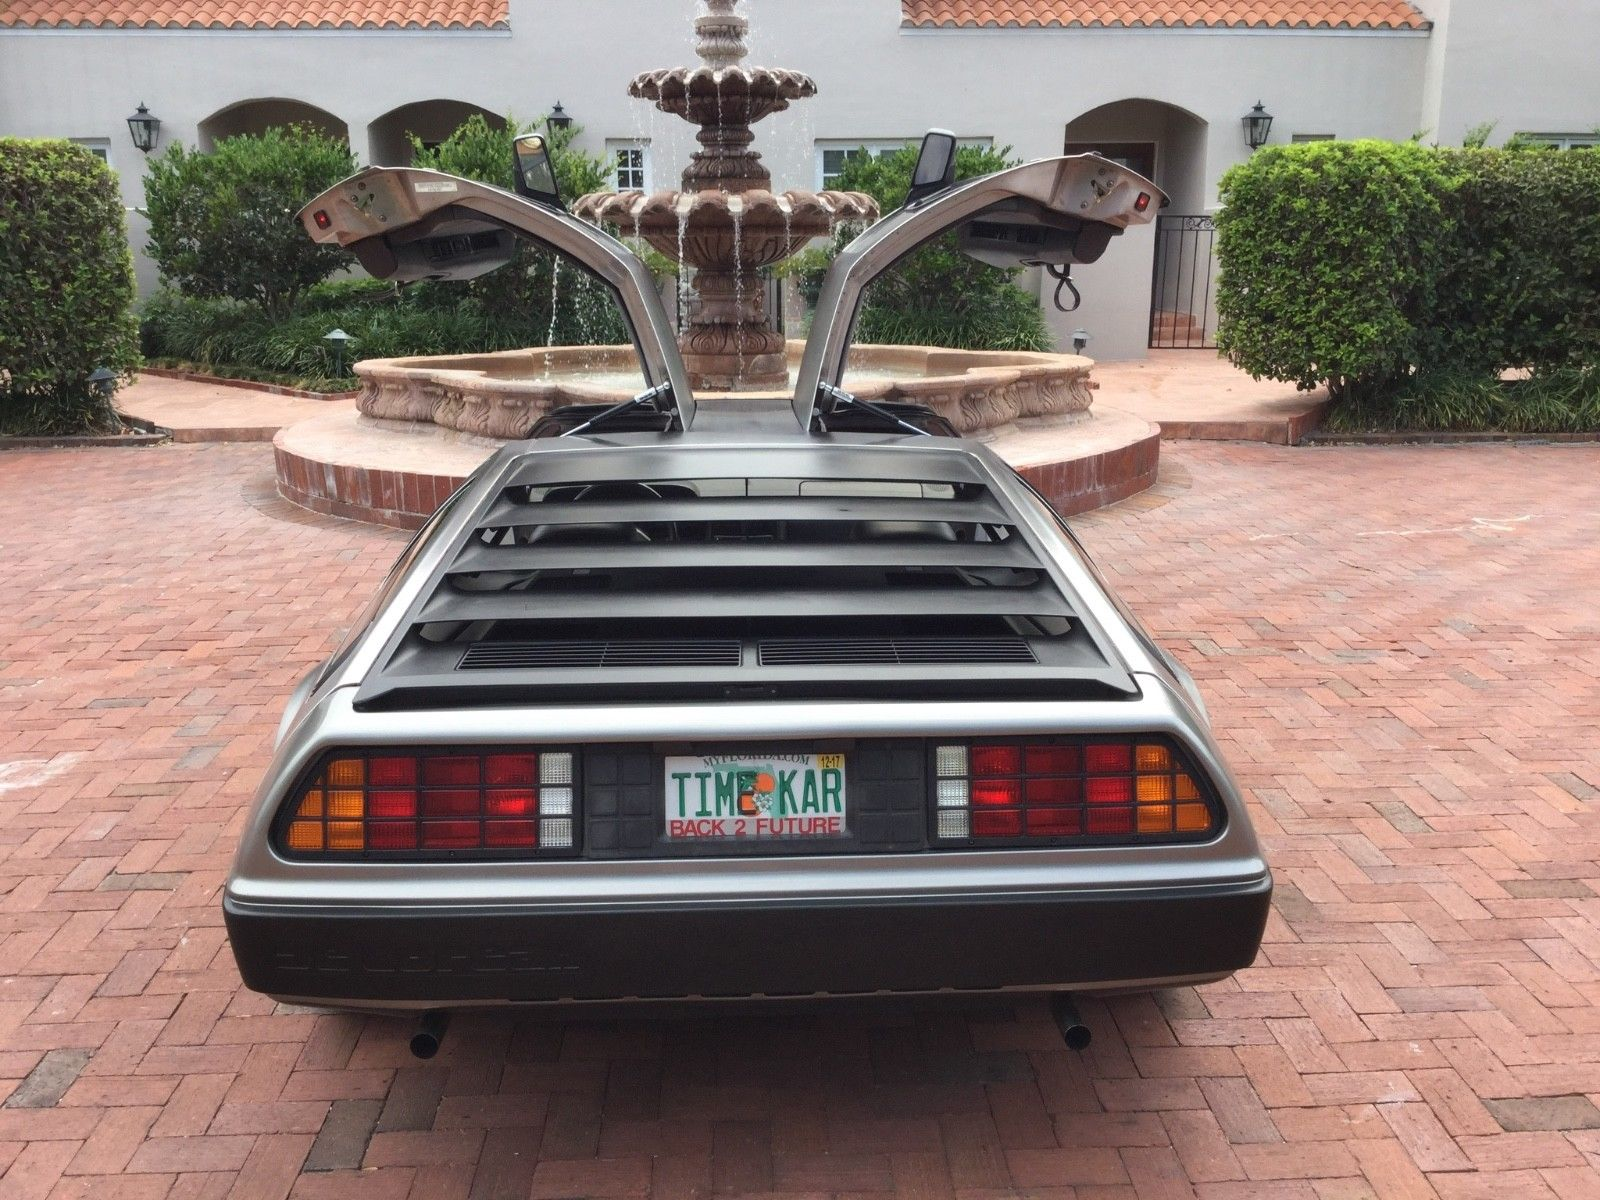 1981 DeLorean DMC-12 rear